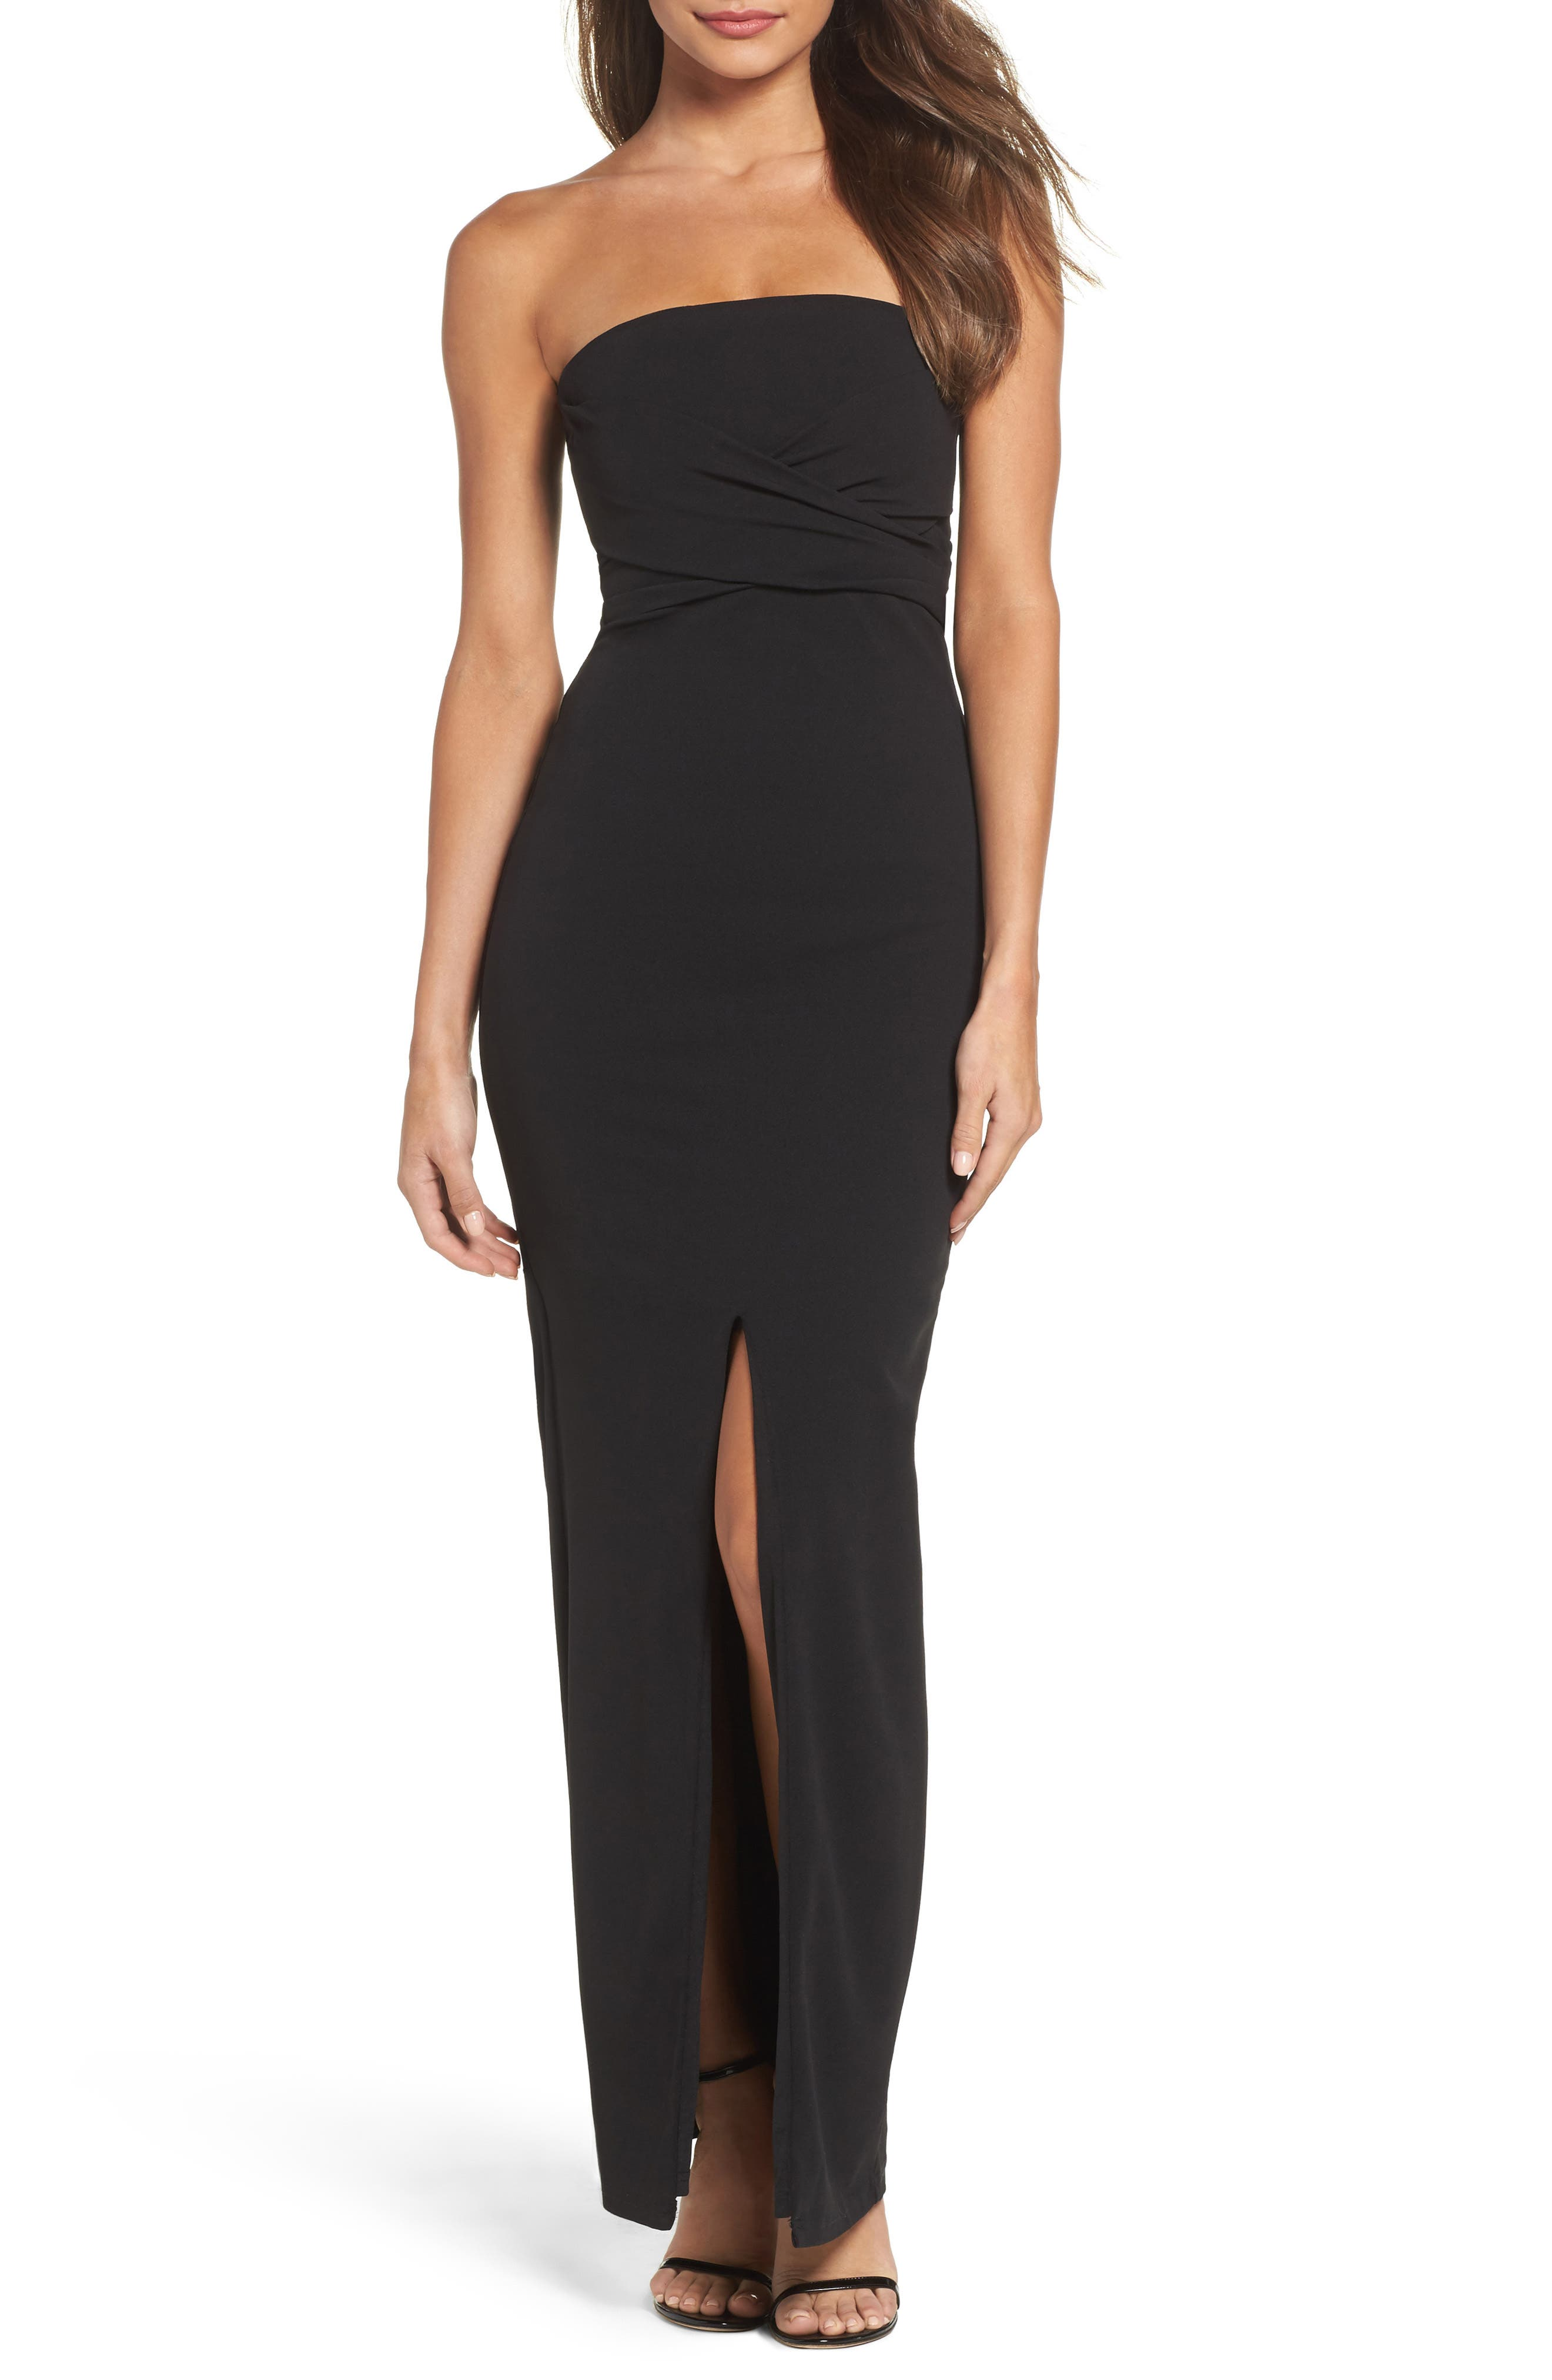 Lulus Own The Night Strapless Maxi Dress